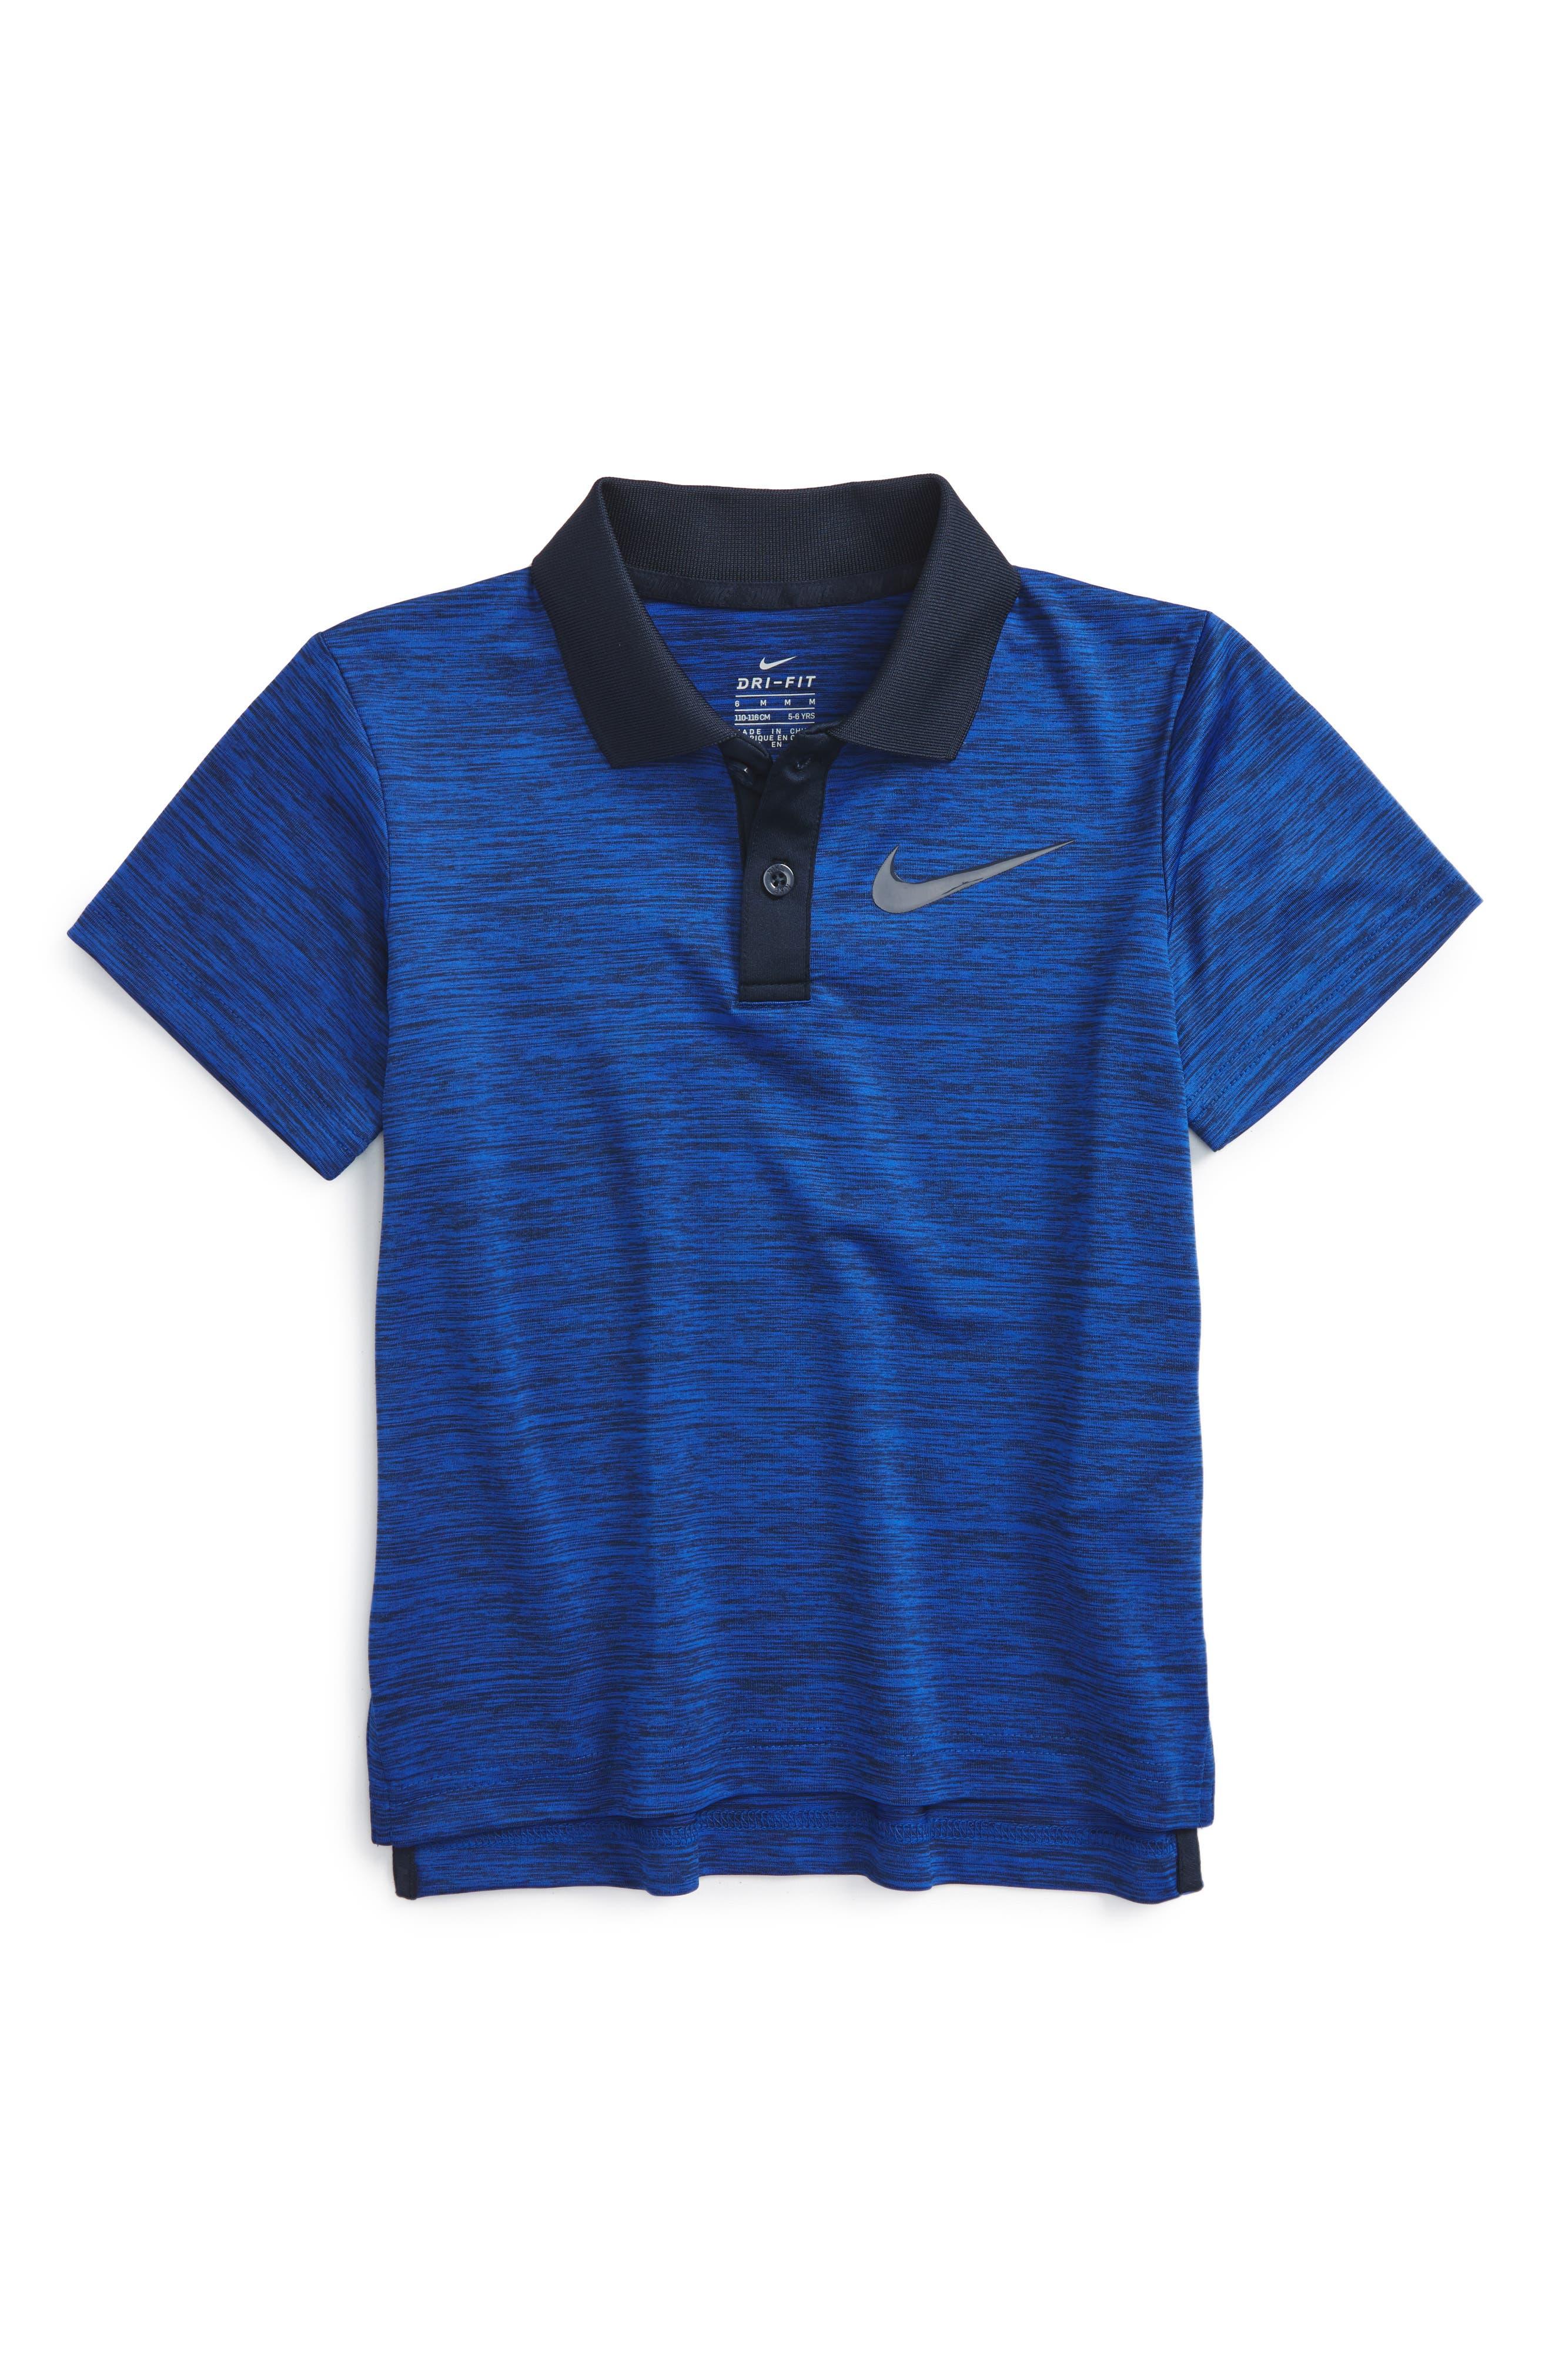 Alternate Image 1 Selected - Nike Dri-FIT Polo (Toddler Boys & Little Boys)